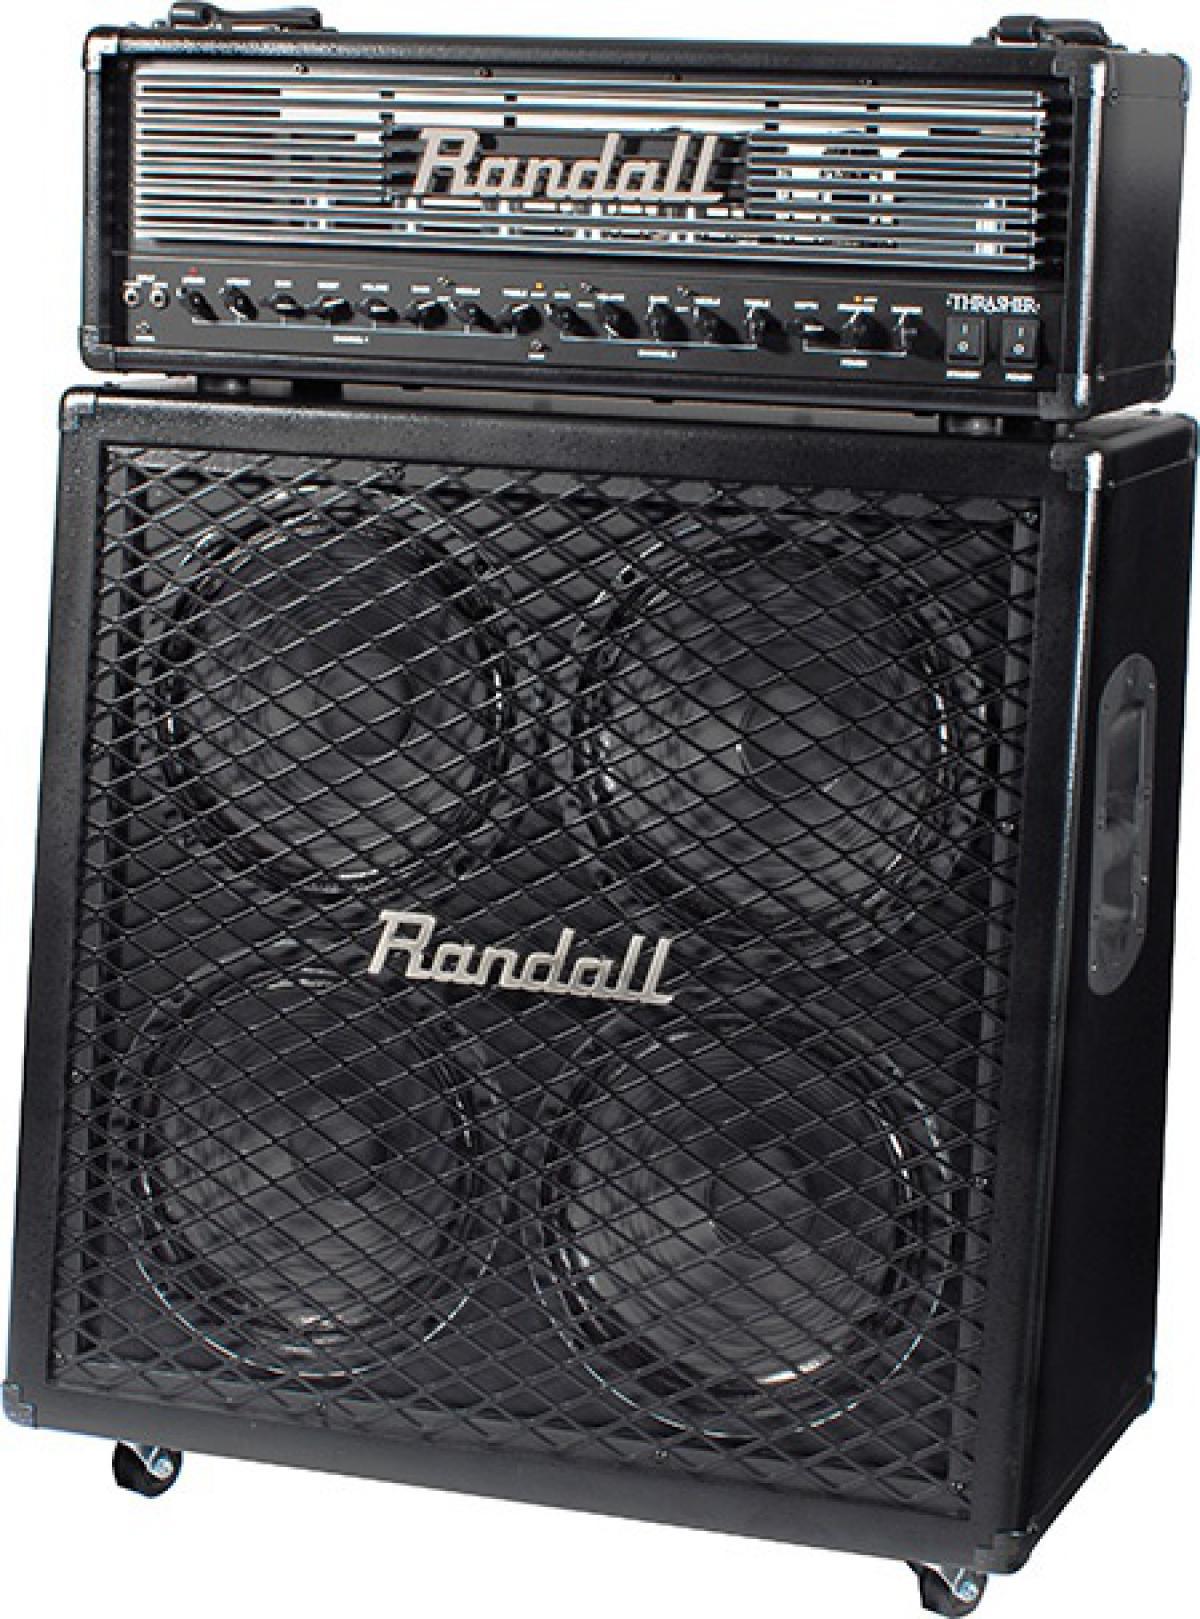 Nuevo Randall Thrasher | Guitarristas info